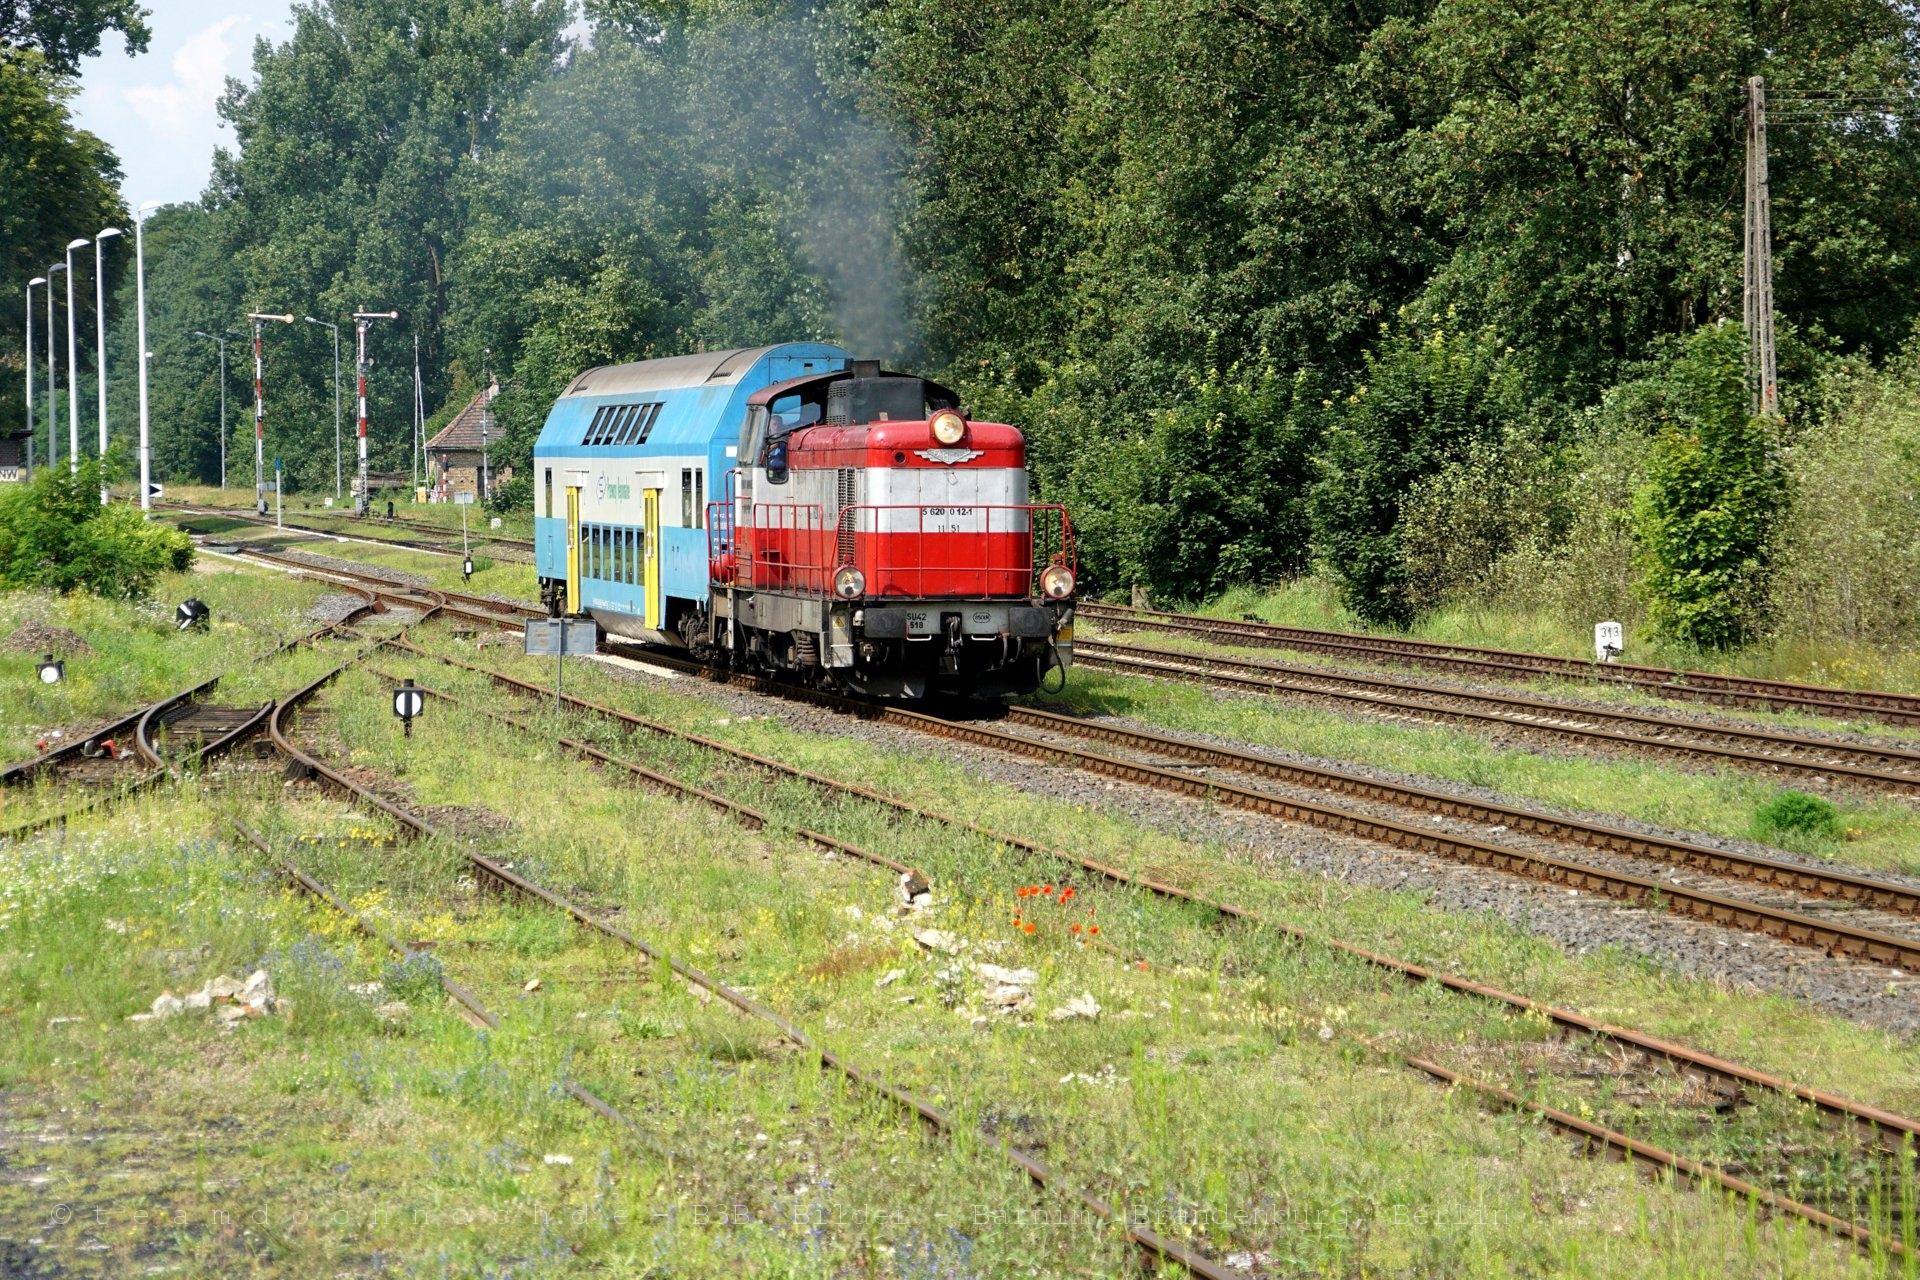 SU42 518 verläßt den Bahnhof Nowiny Wielkie